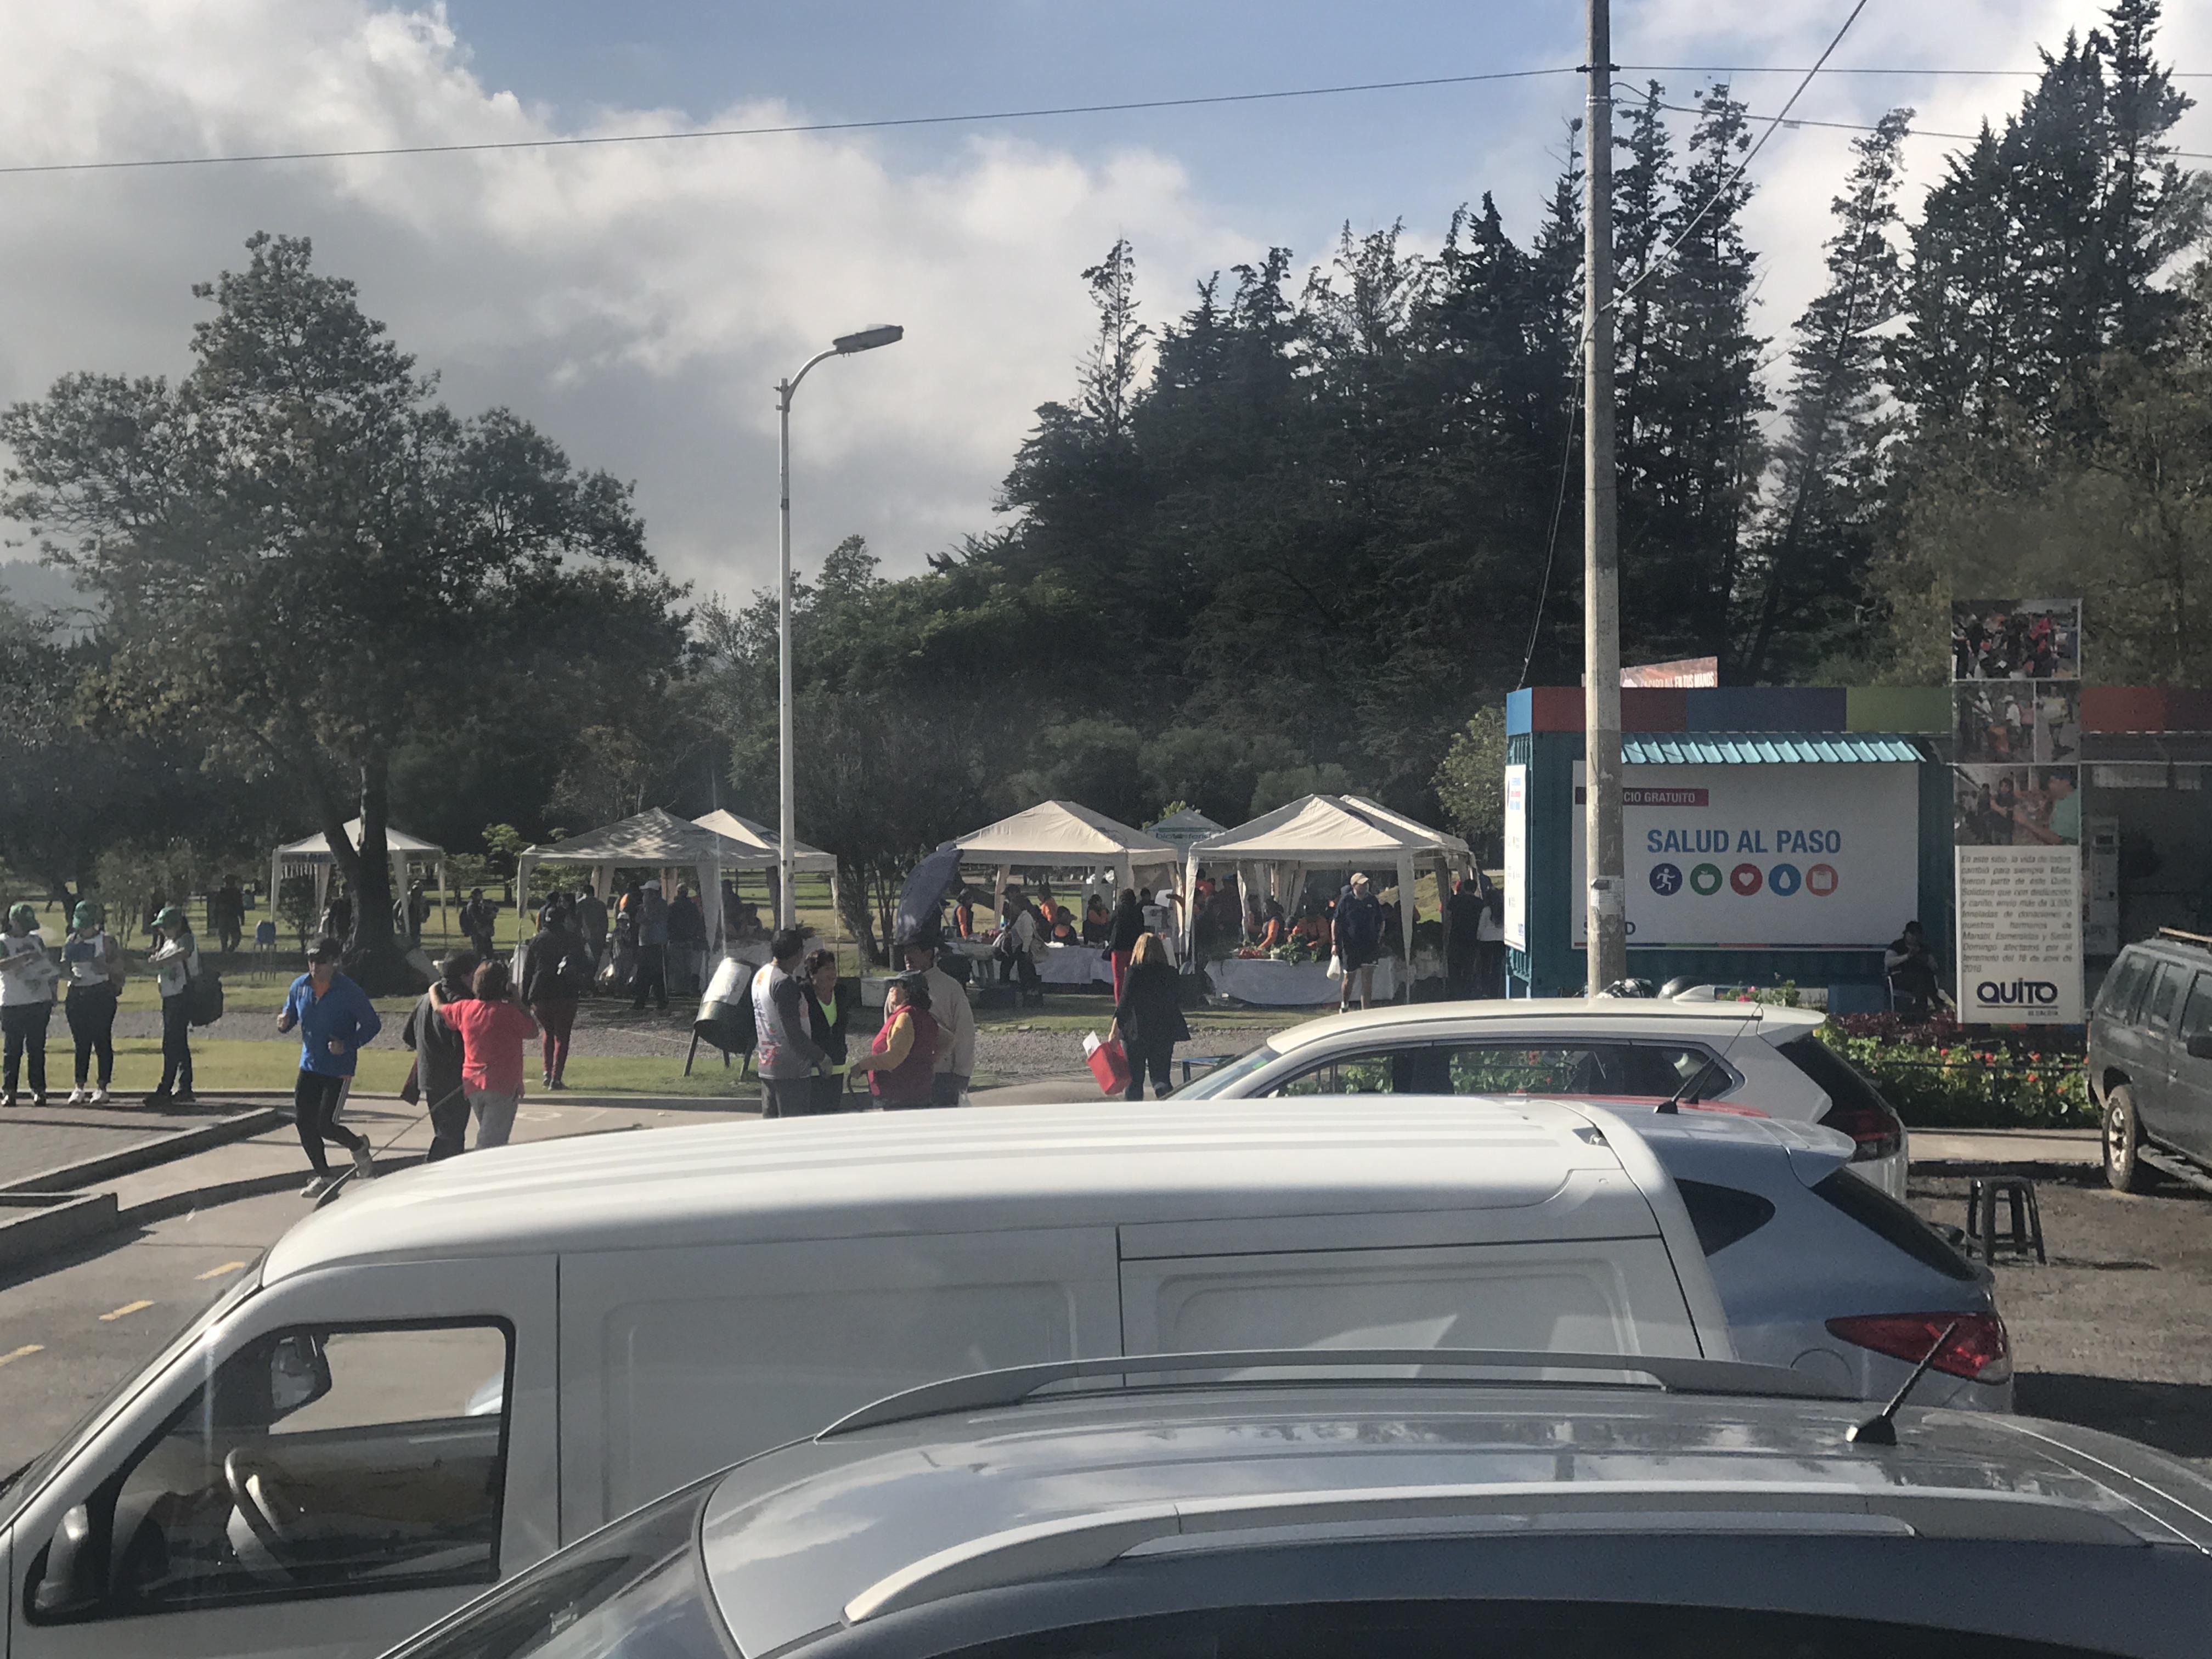 parque carolina farmers market1.JPG